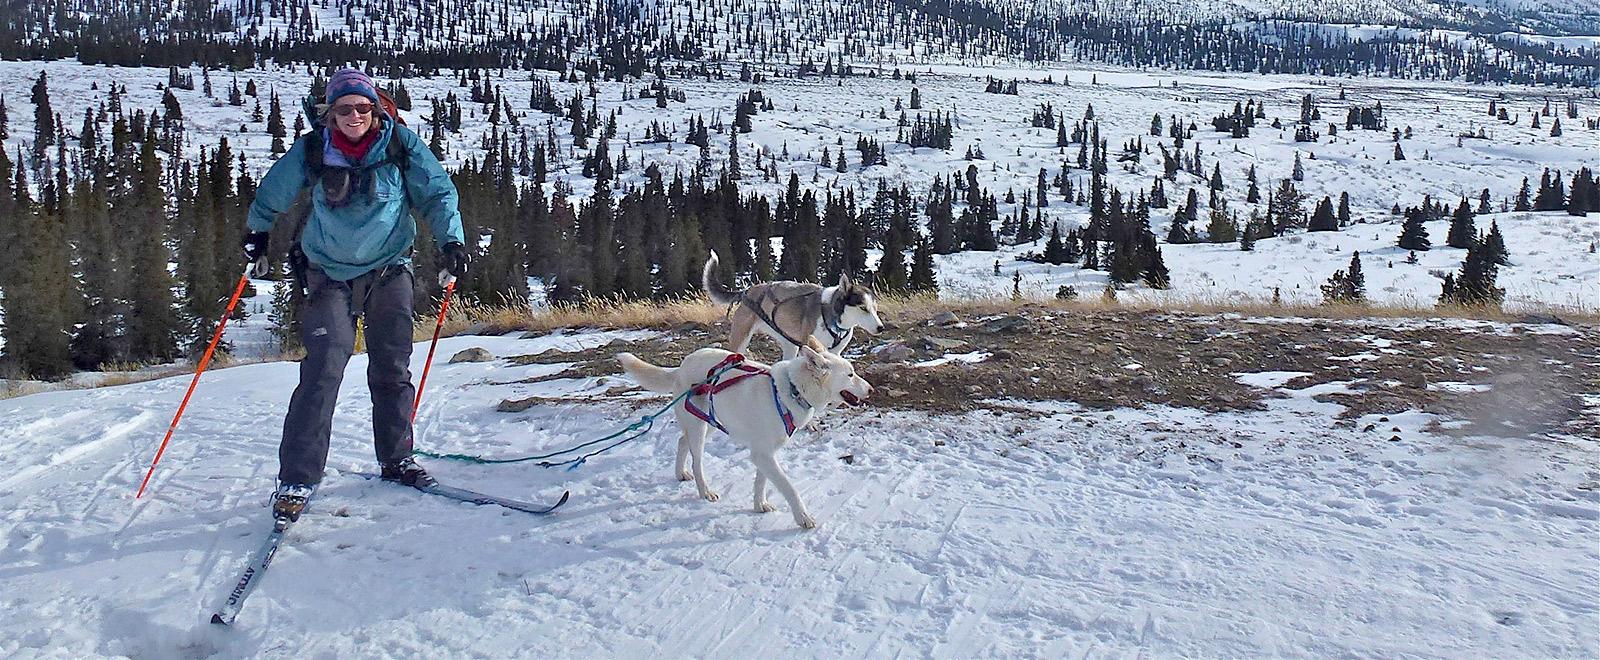 winter ski trips